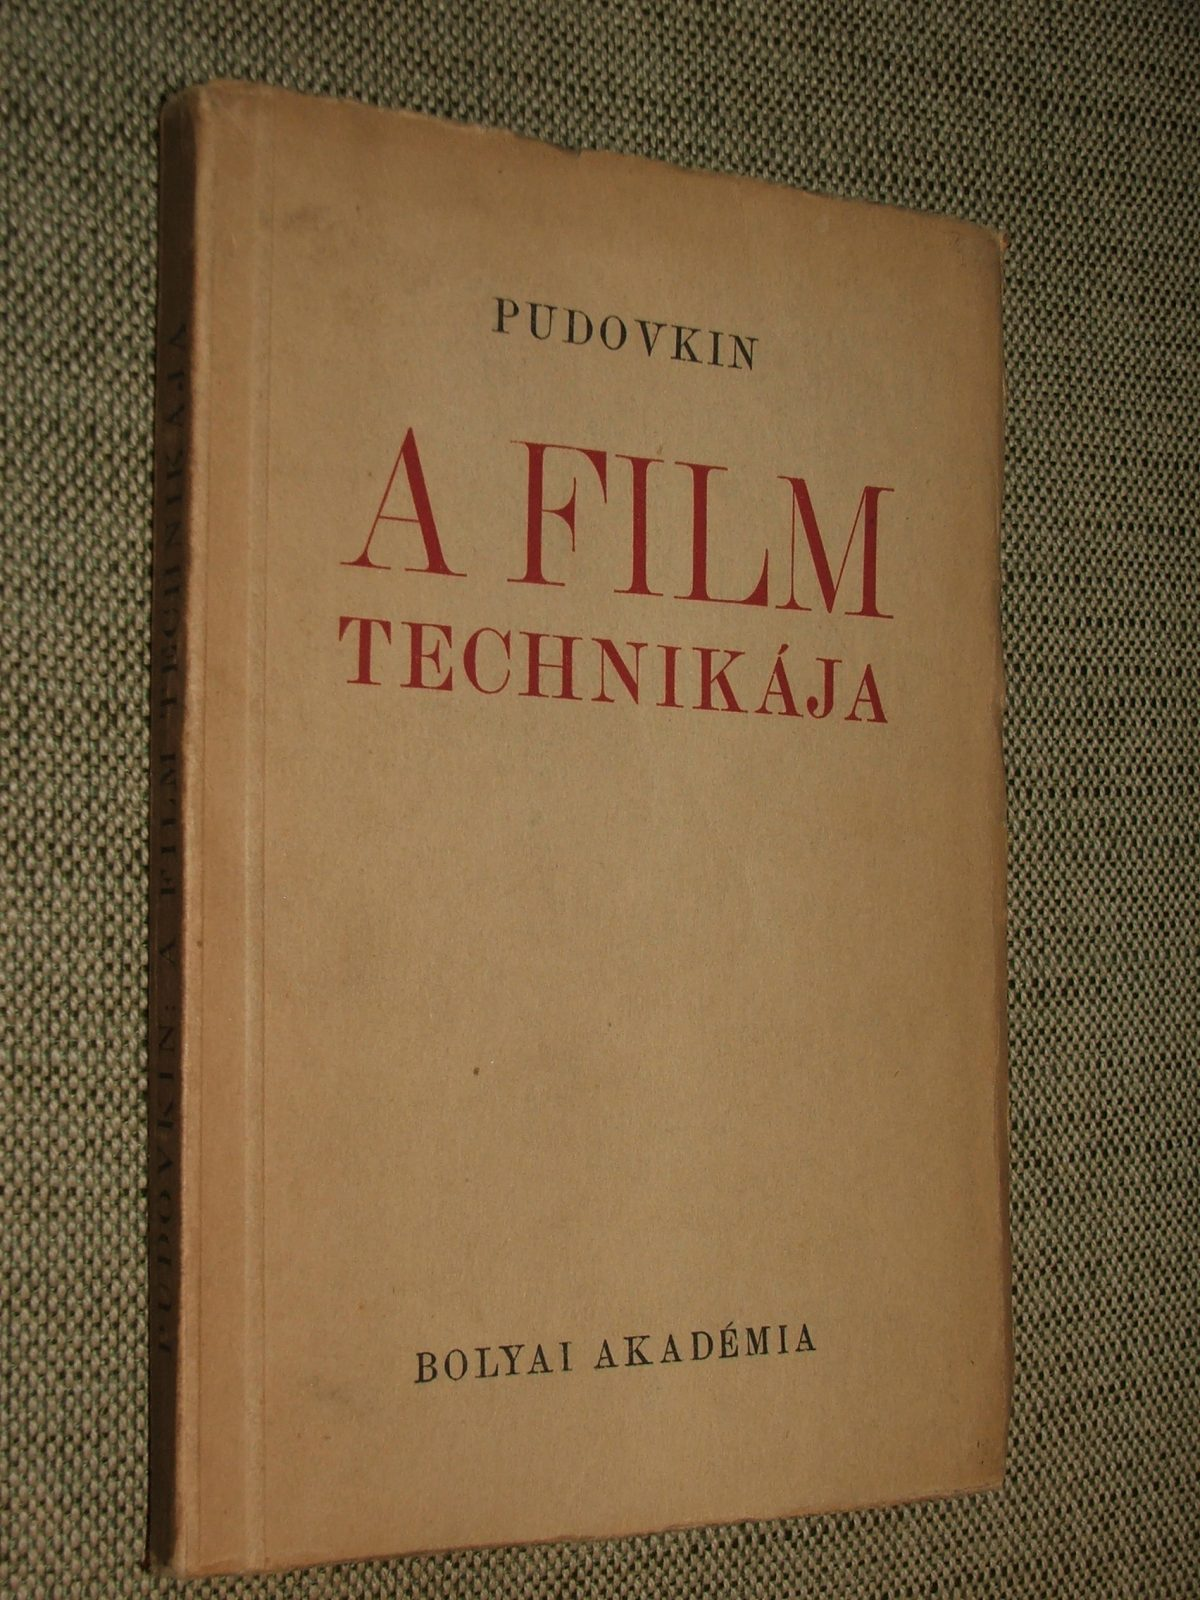 PUDOVKIN (Vsevolod Illarionovics): A film technikája